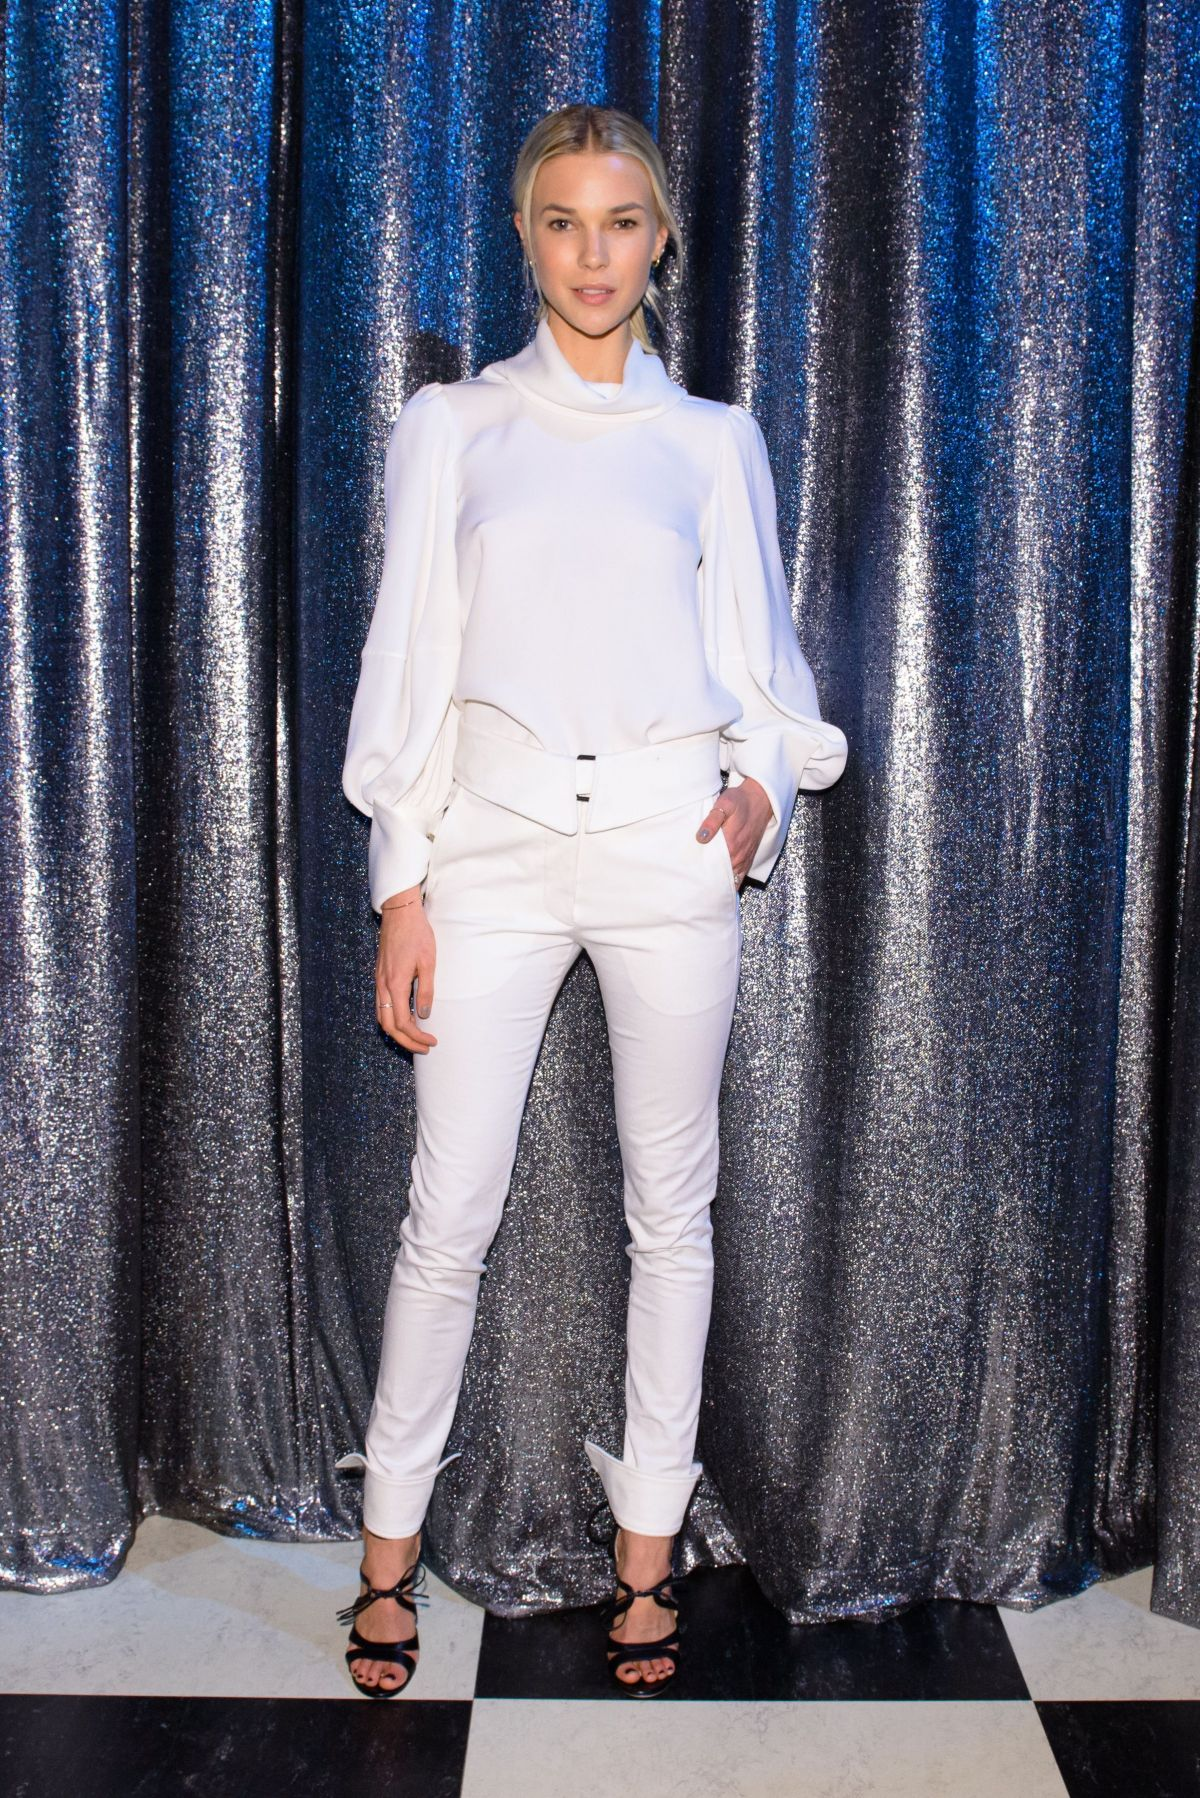 BRITT MAREN at Oscar De La Renta Fashion Show in New York 02/13/2017